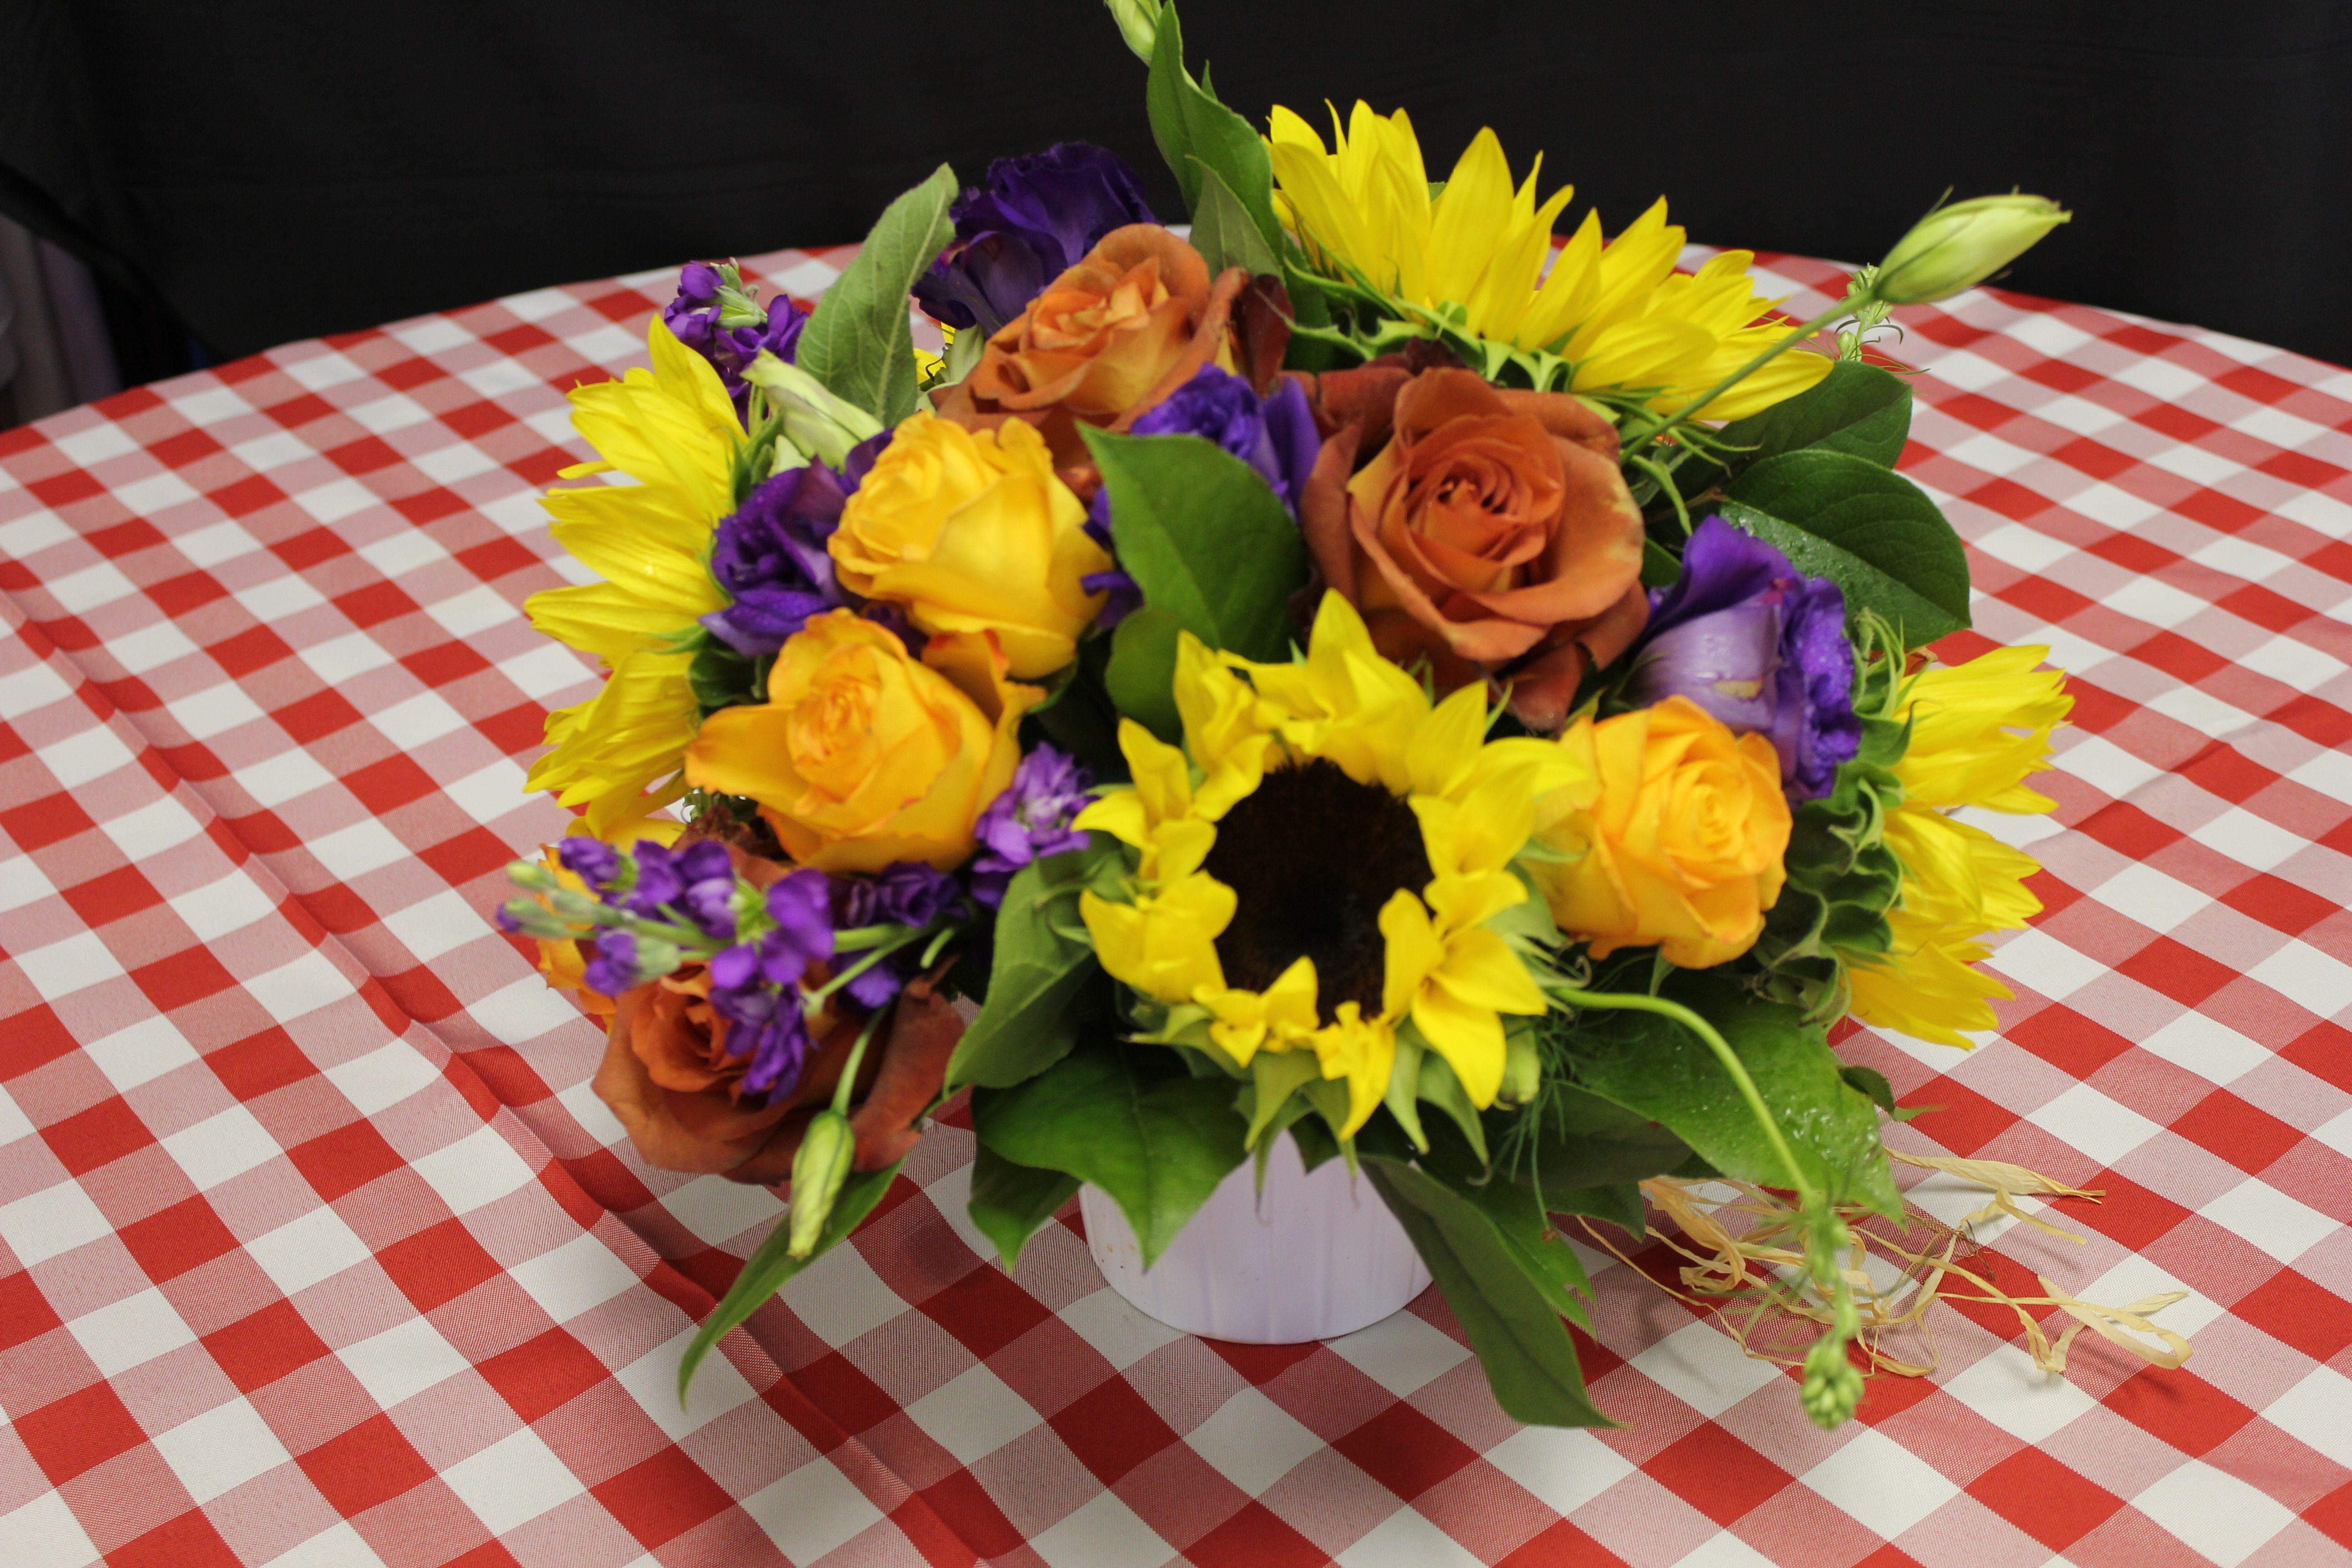 #floral #flowers #arrangement #centerpiece #sunflower